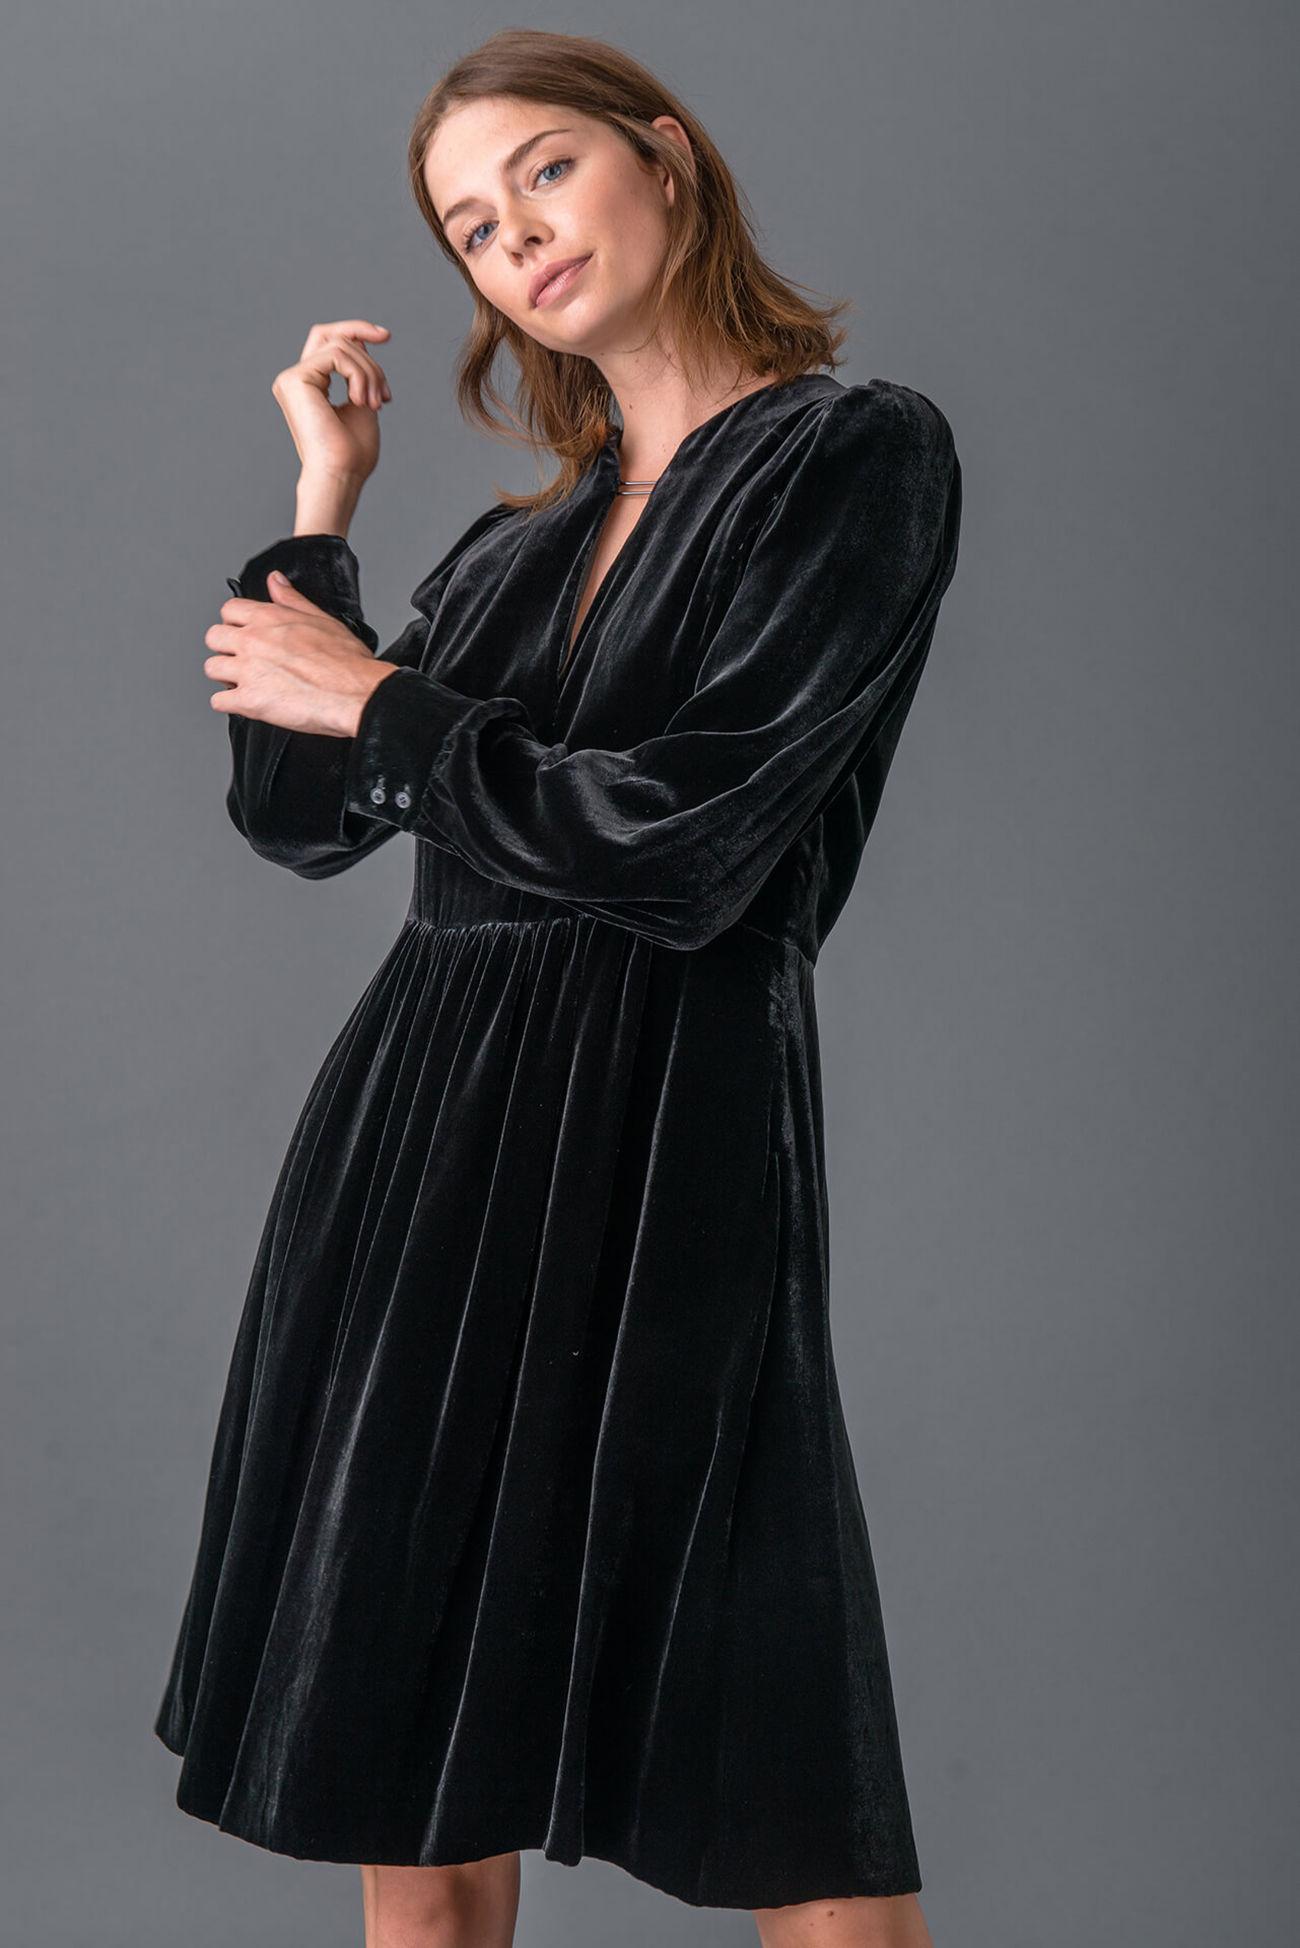 Stilvolles Samtkleid aus Viskose-Seiden-Mix